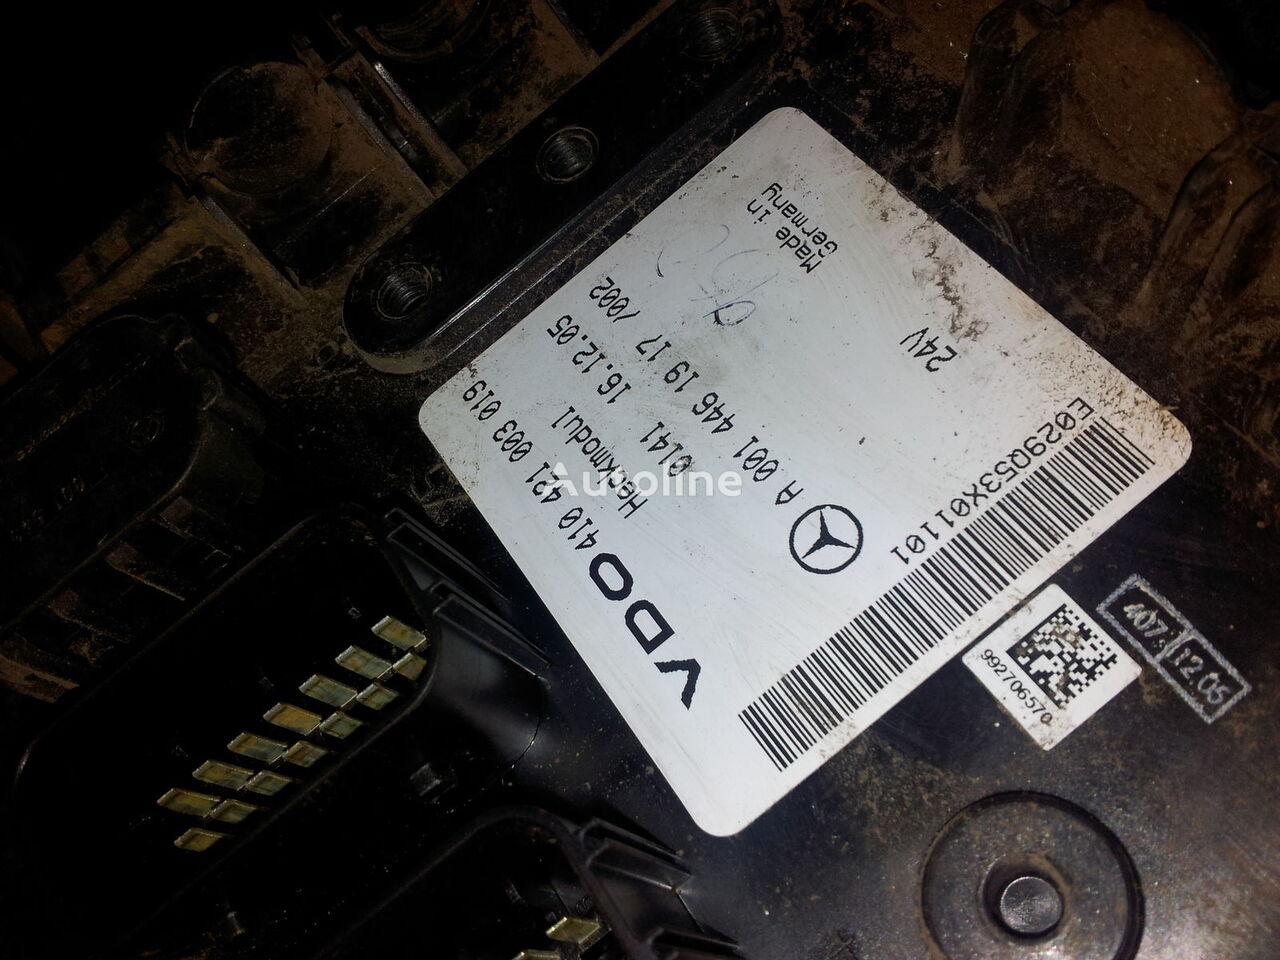 MB Actros MP2, MP3, Heckmodul, control unit, EDC, ECU, rear module electronics, 0014461917, 0014462817, 0014462017,0014461917,0014462717,0014461617, 41021003020, 410421003019, 0014462817 control unit for MERCEDES-BENZ Actros MP2; MP3 tractor unit